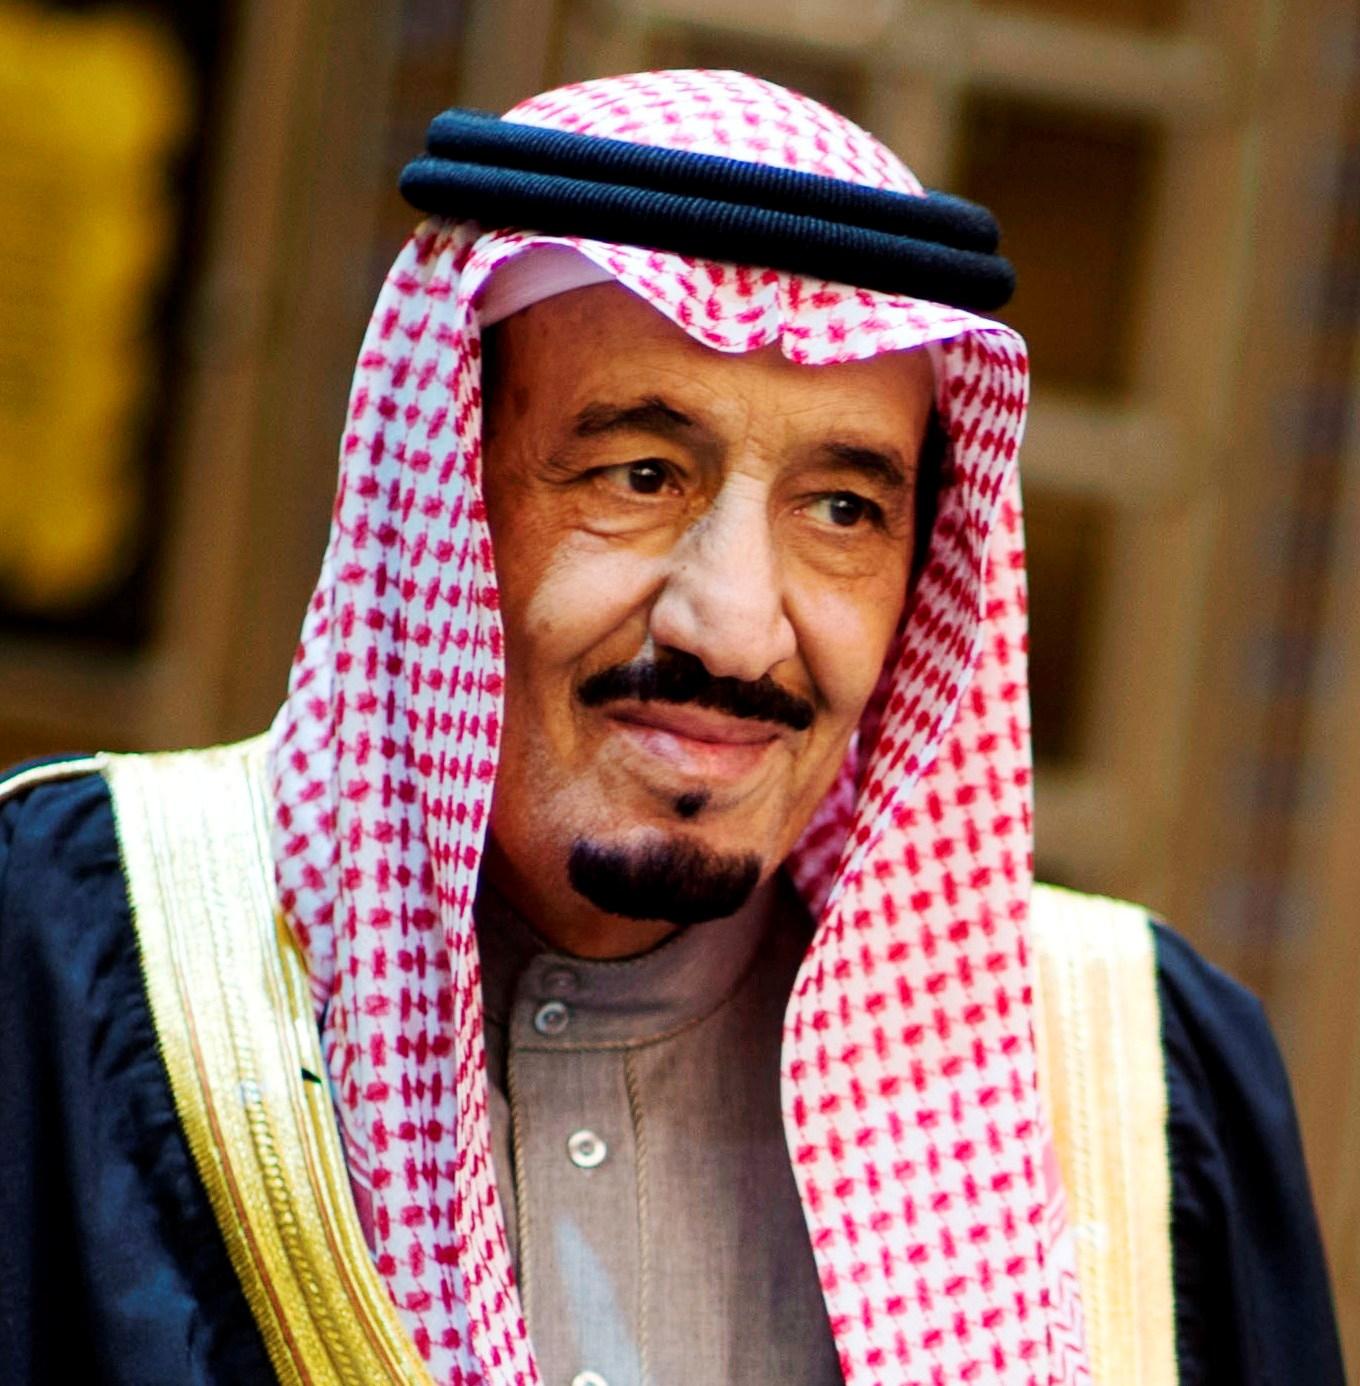 Der neue König Saudi-Arabiens: Salman bin Abdulaziz bin Saud. (Quelle: Public Domain via Wikimedia Commons)